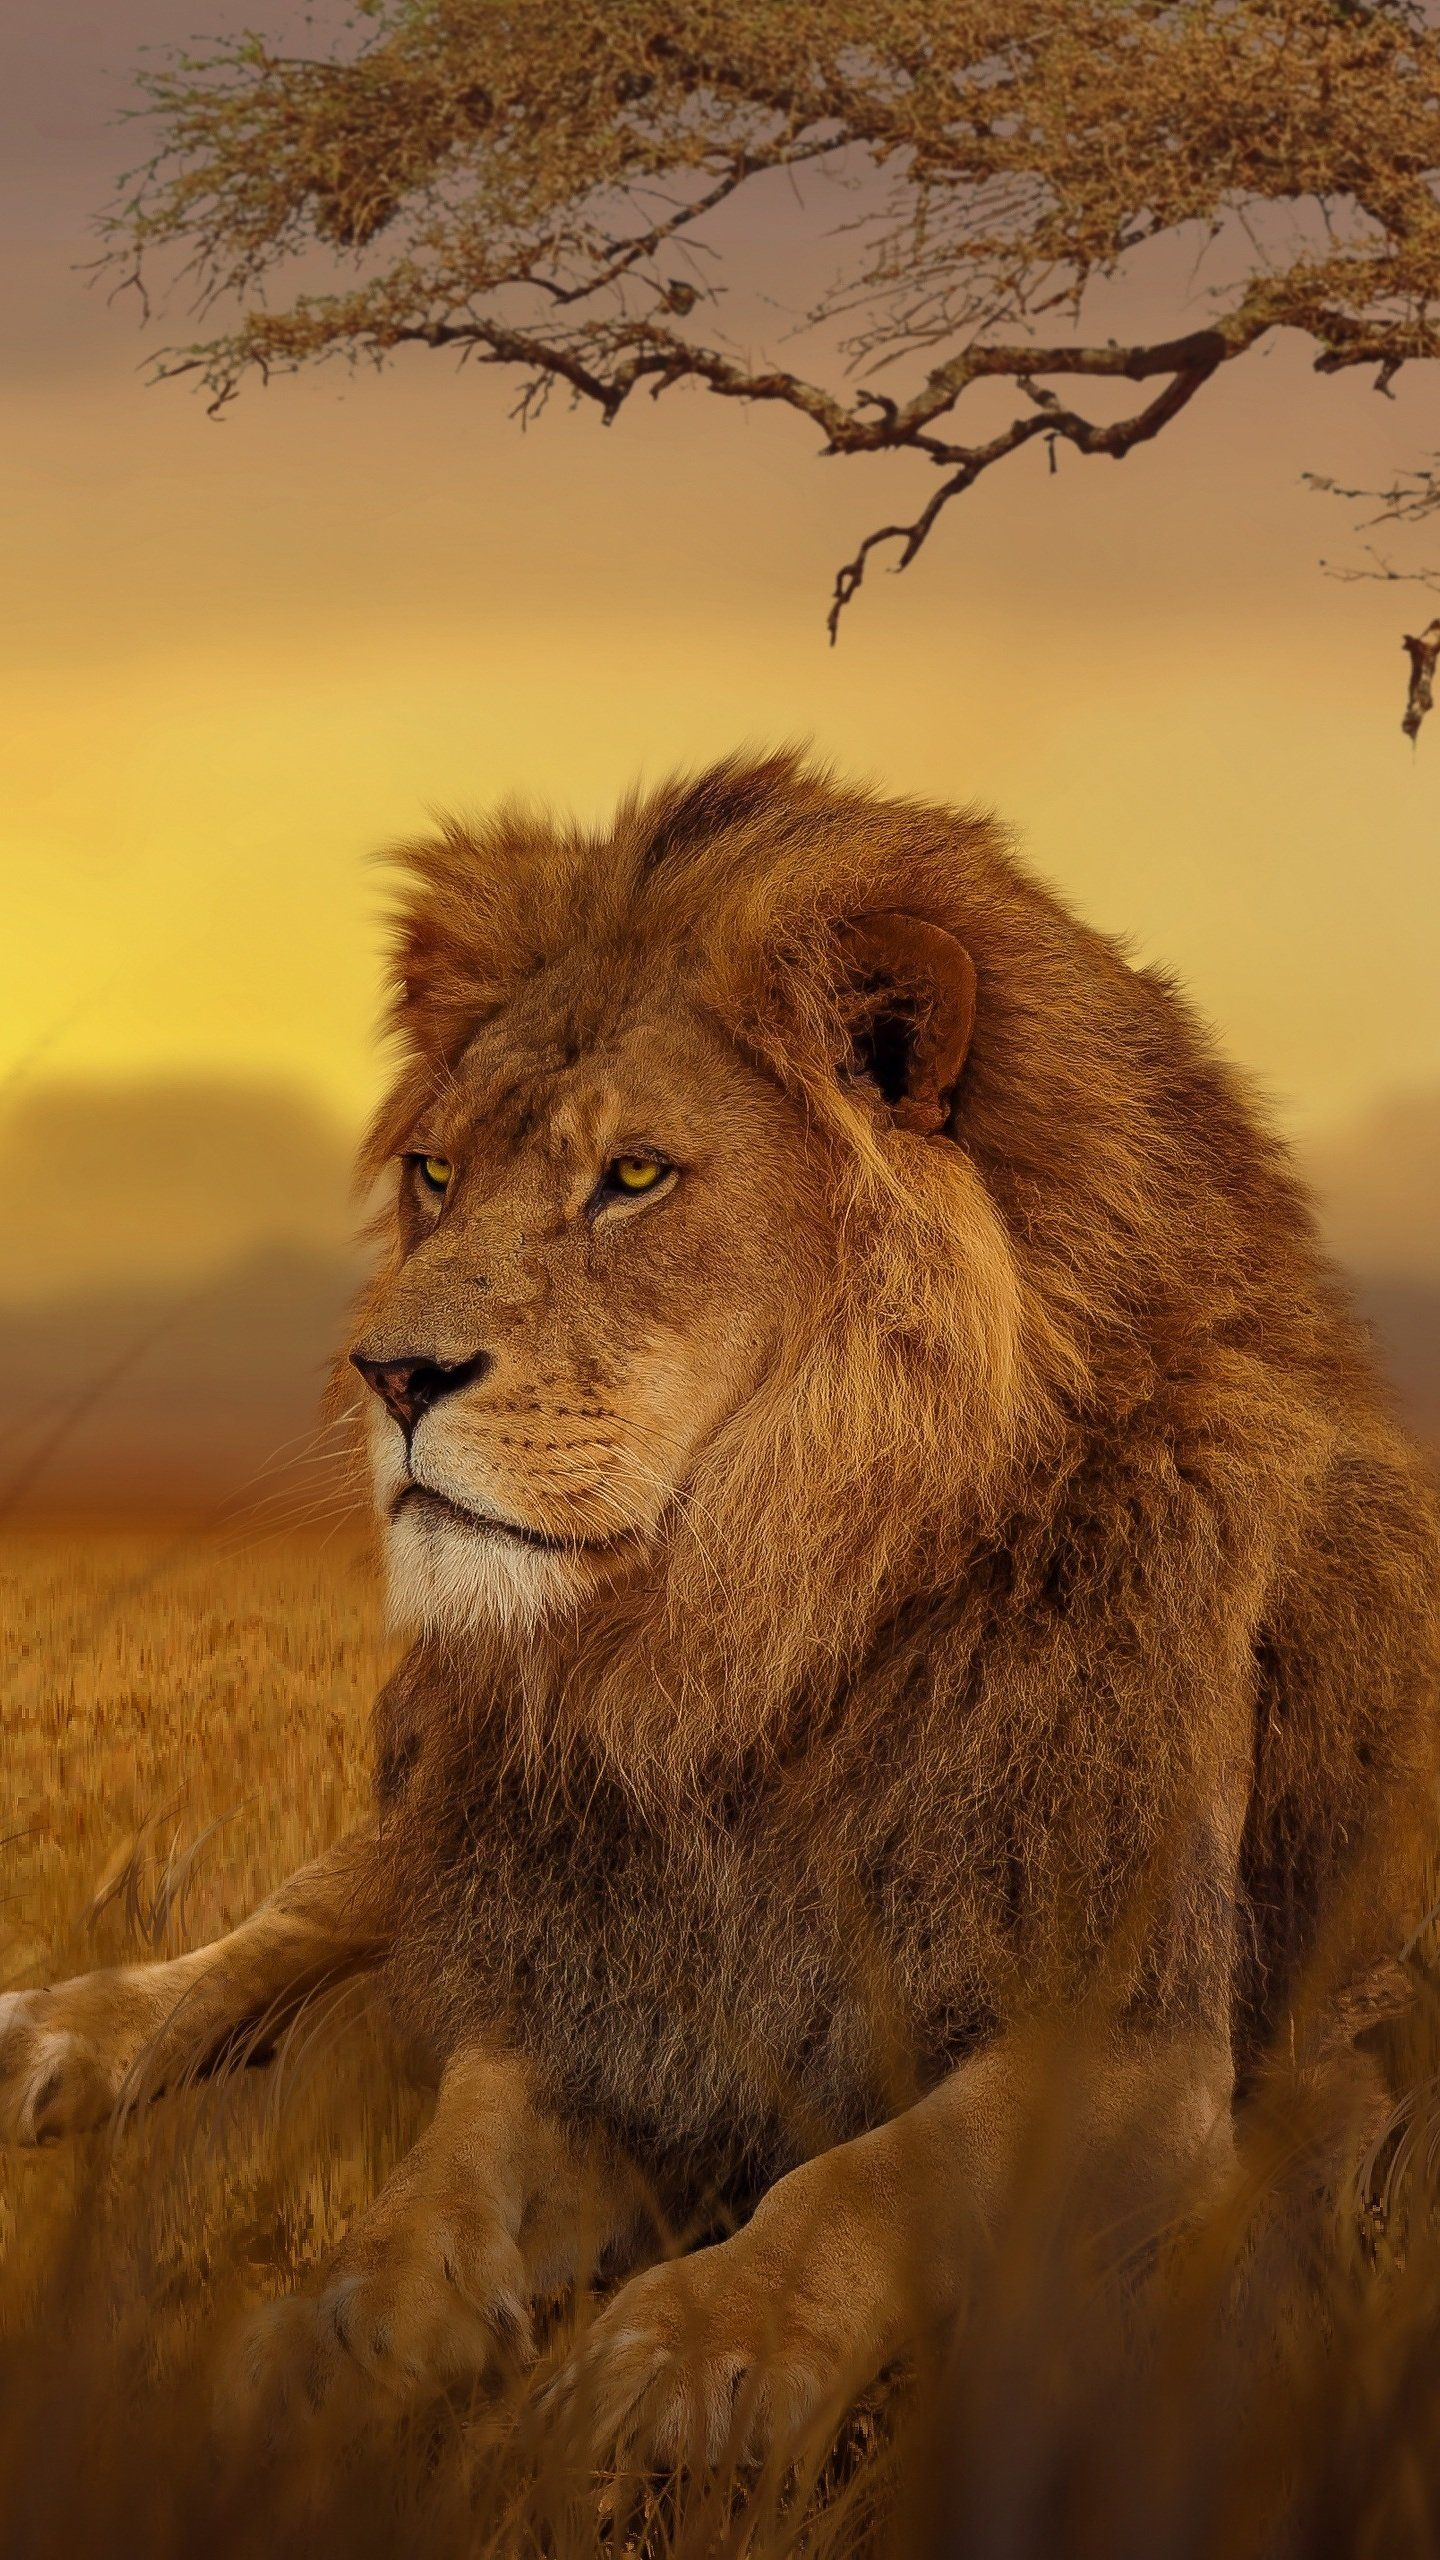 Lion Forest 5k Hd Wallpaper In 2020 Animal Wallpaper Lion Hd Wallpaper Animals